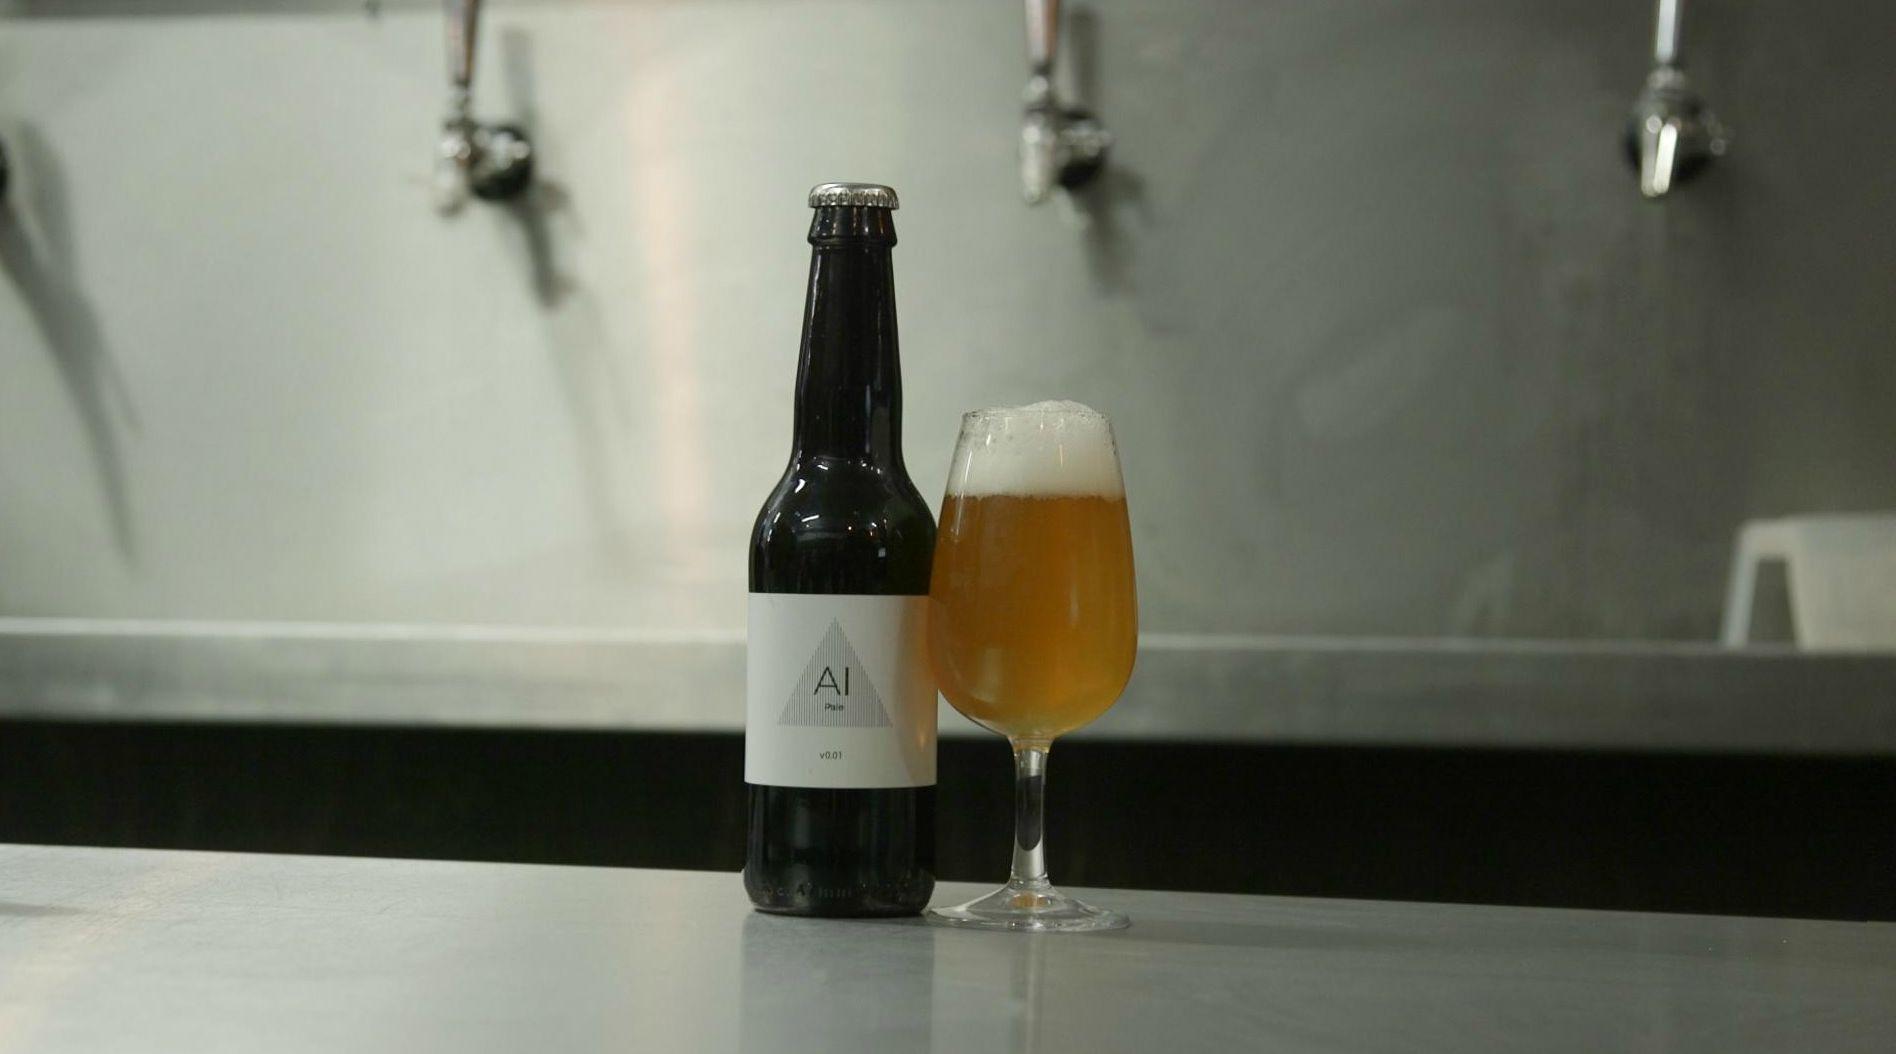 Artificial intelligence beer intelligentx